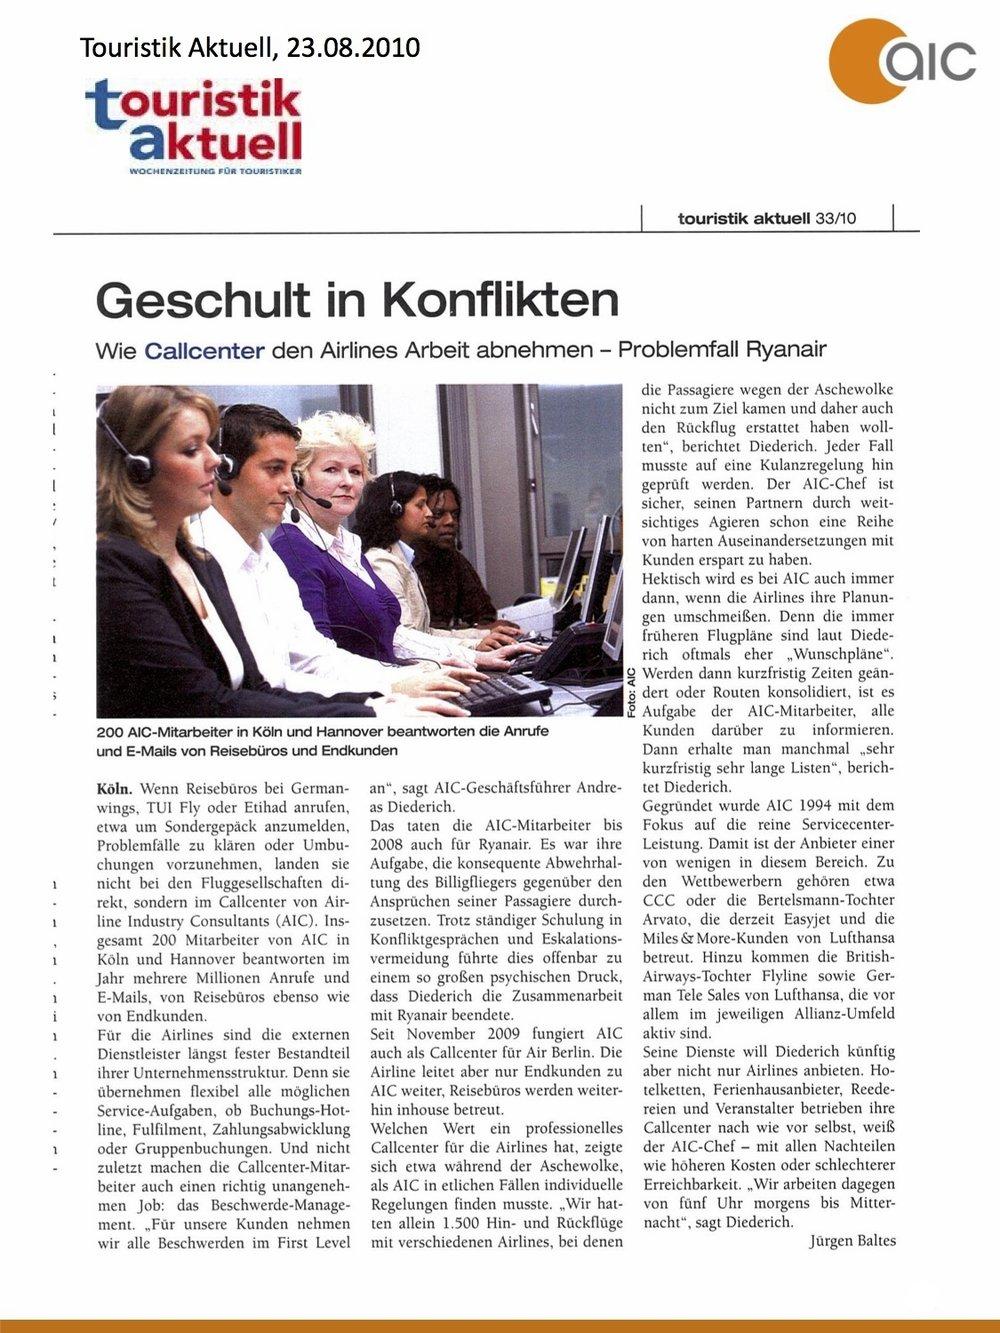 aic pressespiegel 28.jpg